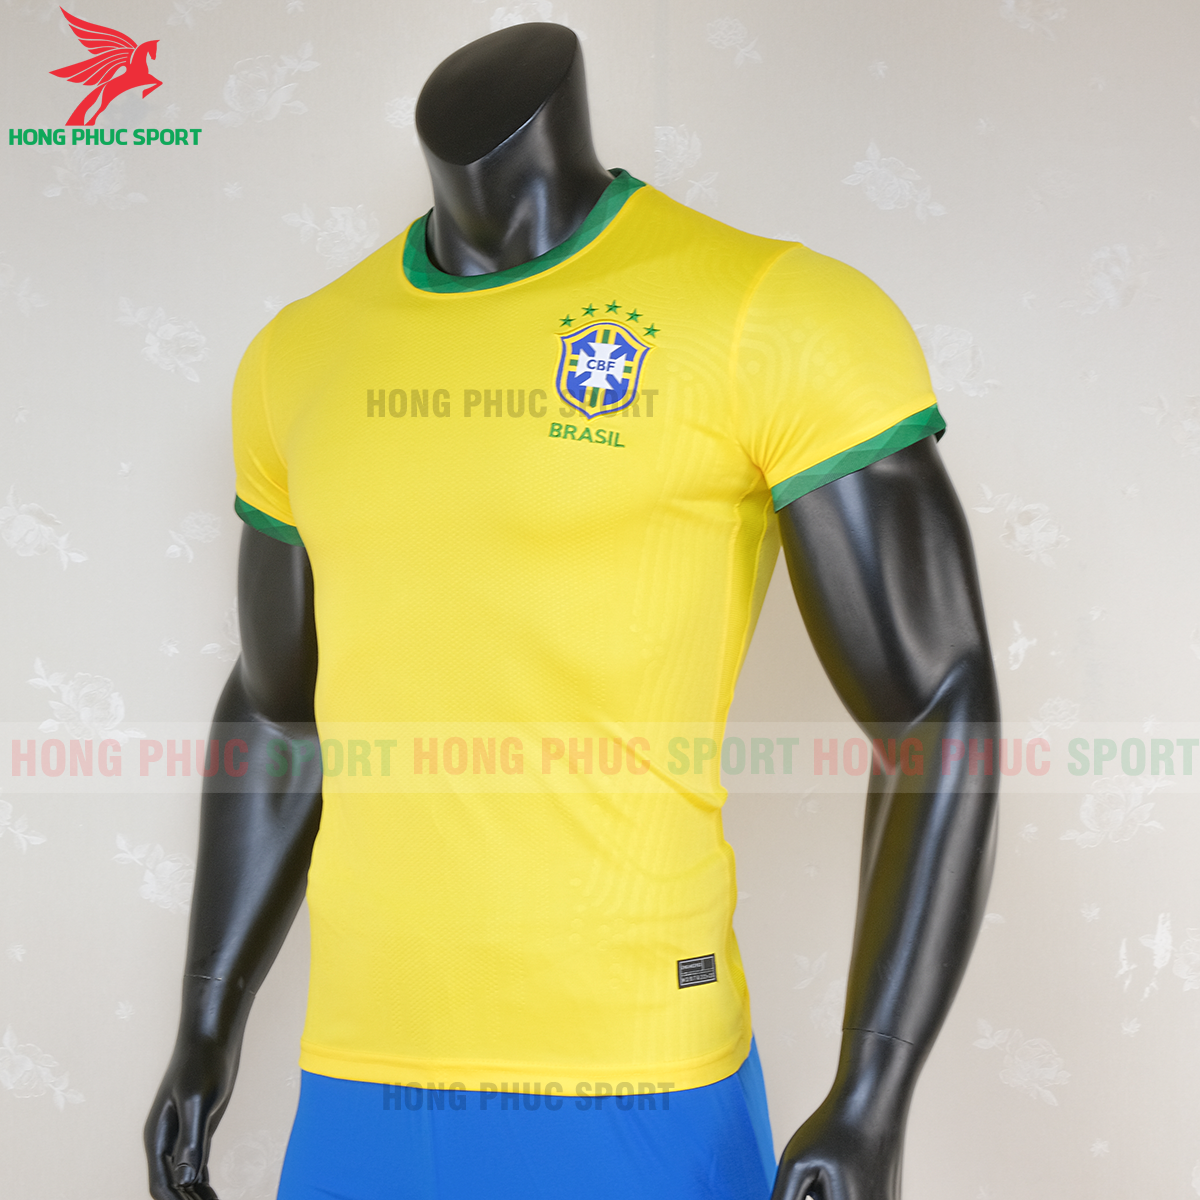 https://cdn.hongphucsport.com/unsafe/s4.shopbay.vn/files/285/ao-bong-da-tuyen-brazil-2020-2021-san-nha-3-5f71699455327.png